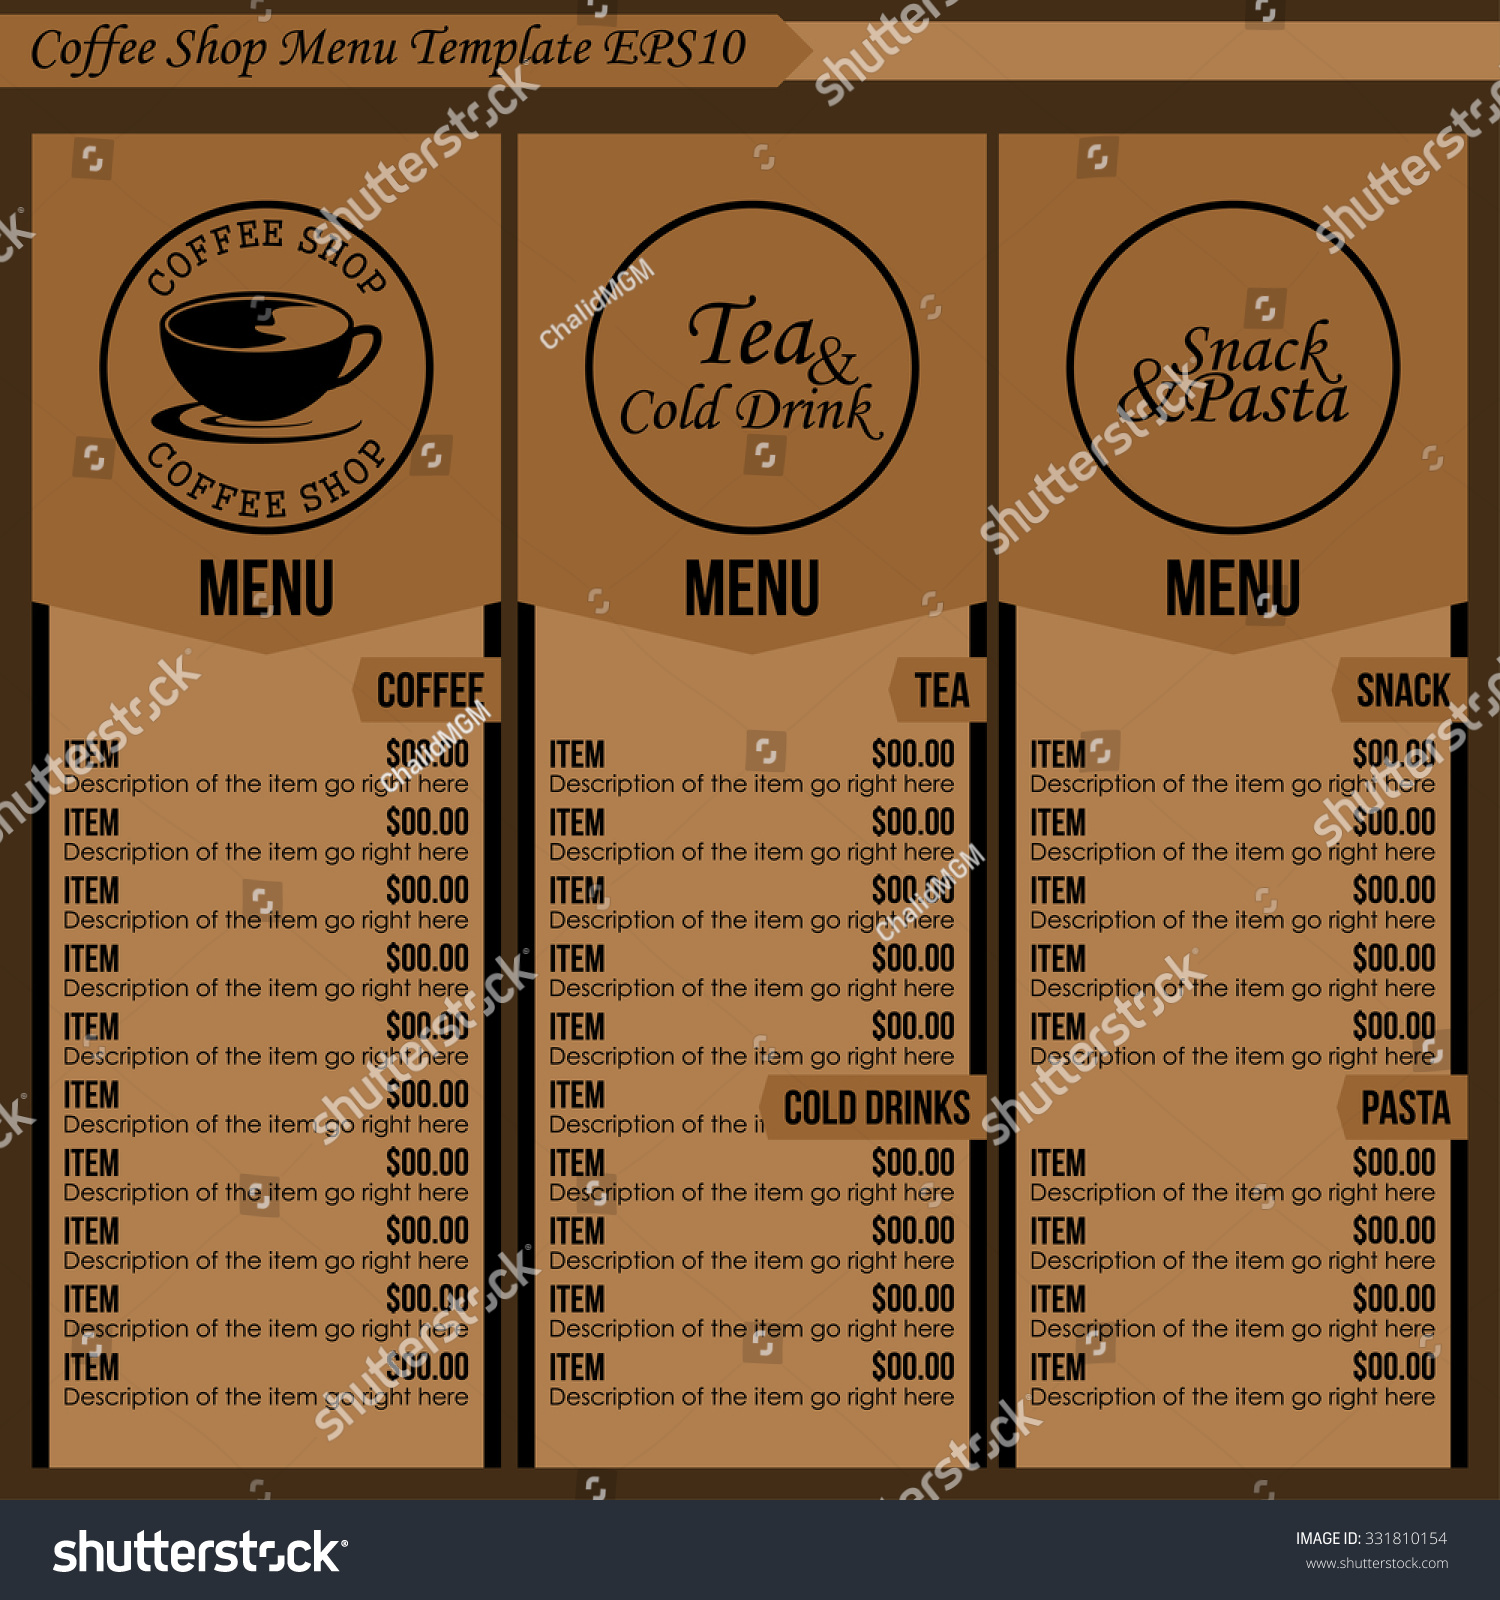 Coffee Shop Menu Template 1